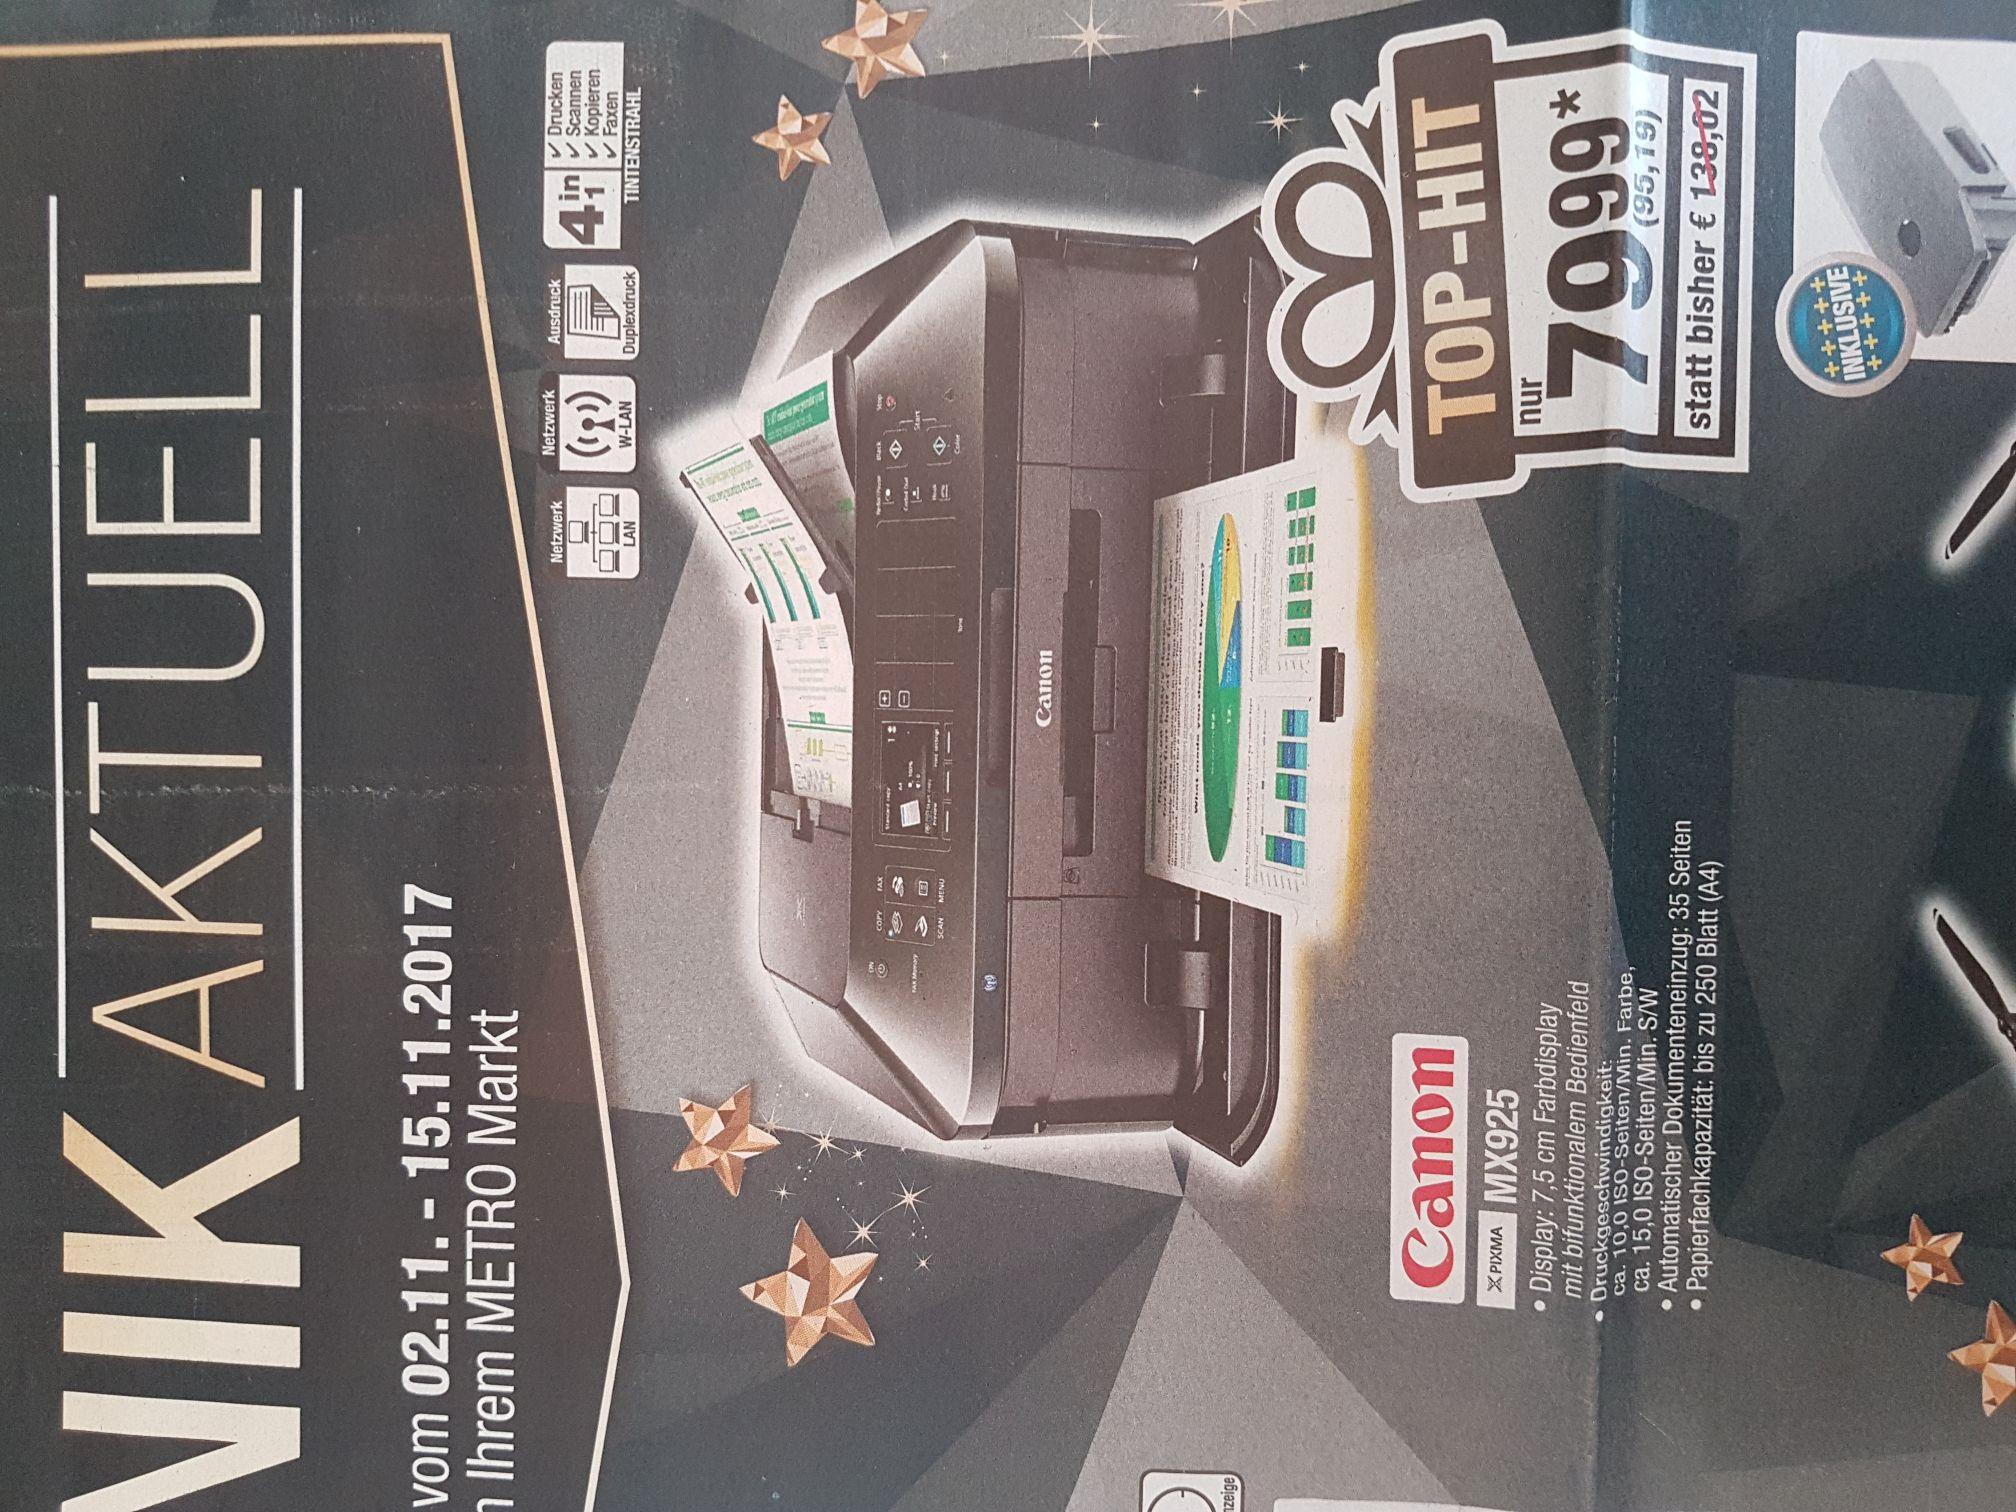 [Metro] Canon Pixma MX925 Multifunktions Tintenstrahl Drucker